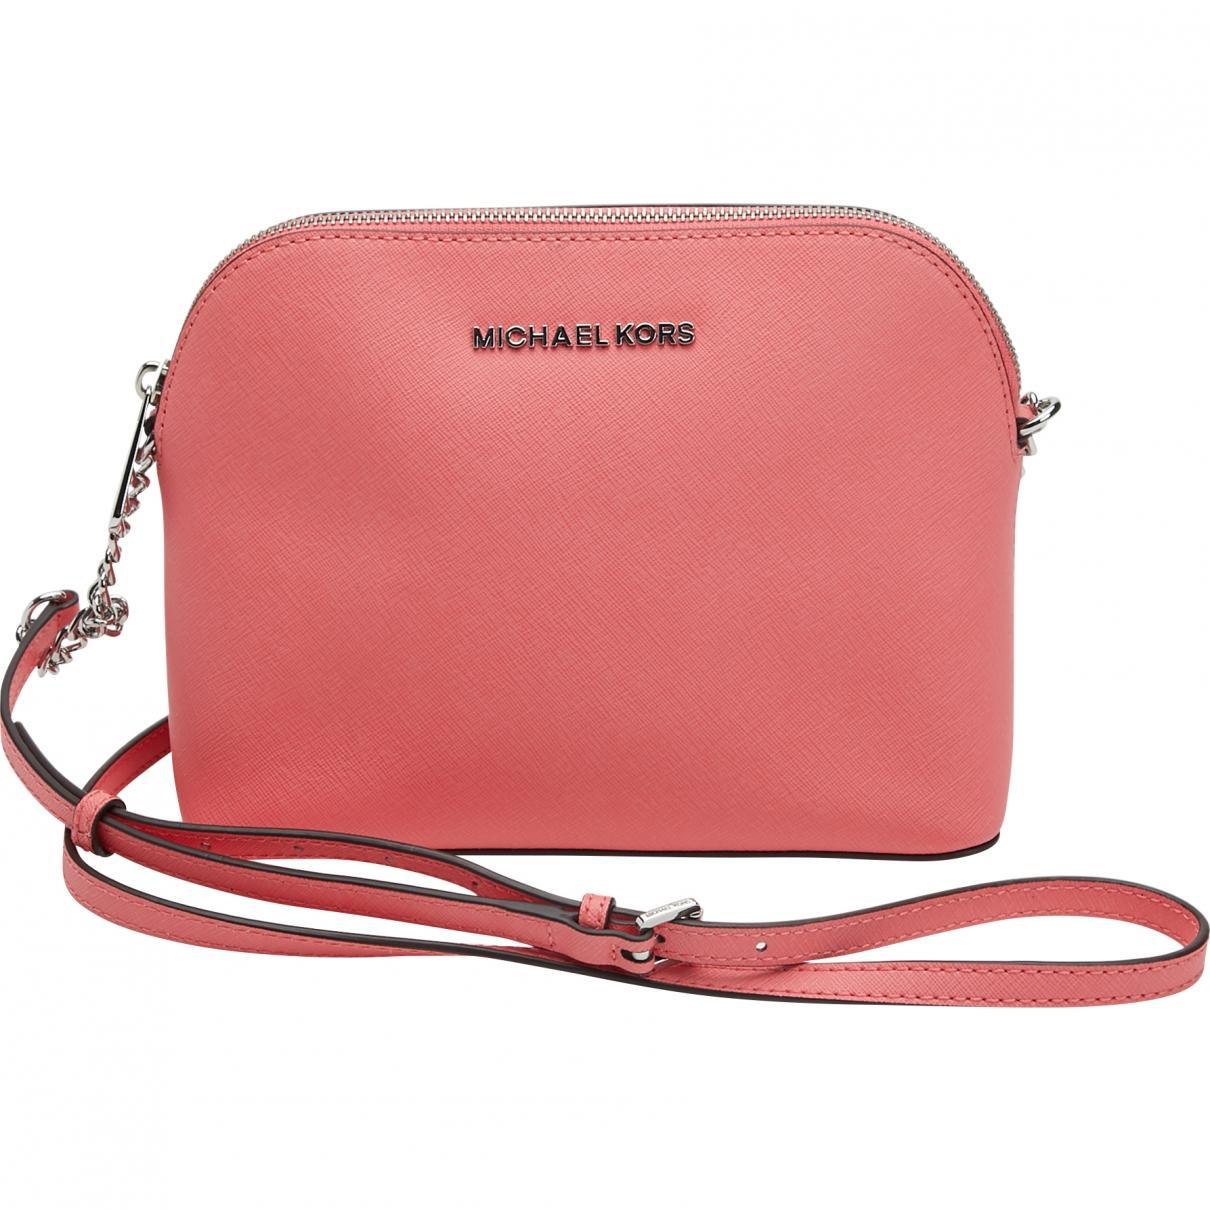 d1e4ed17317f Michael Kors Pink Leather Handbag in Pink - Lyst